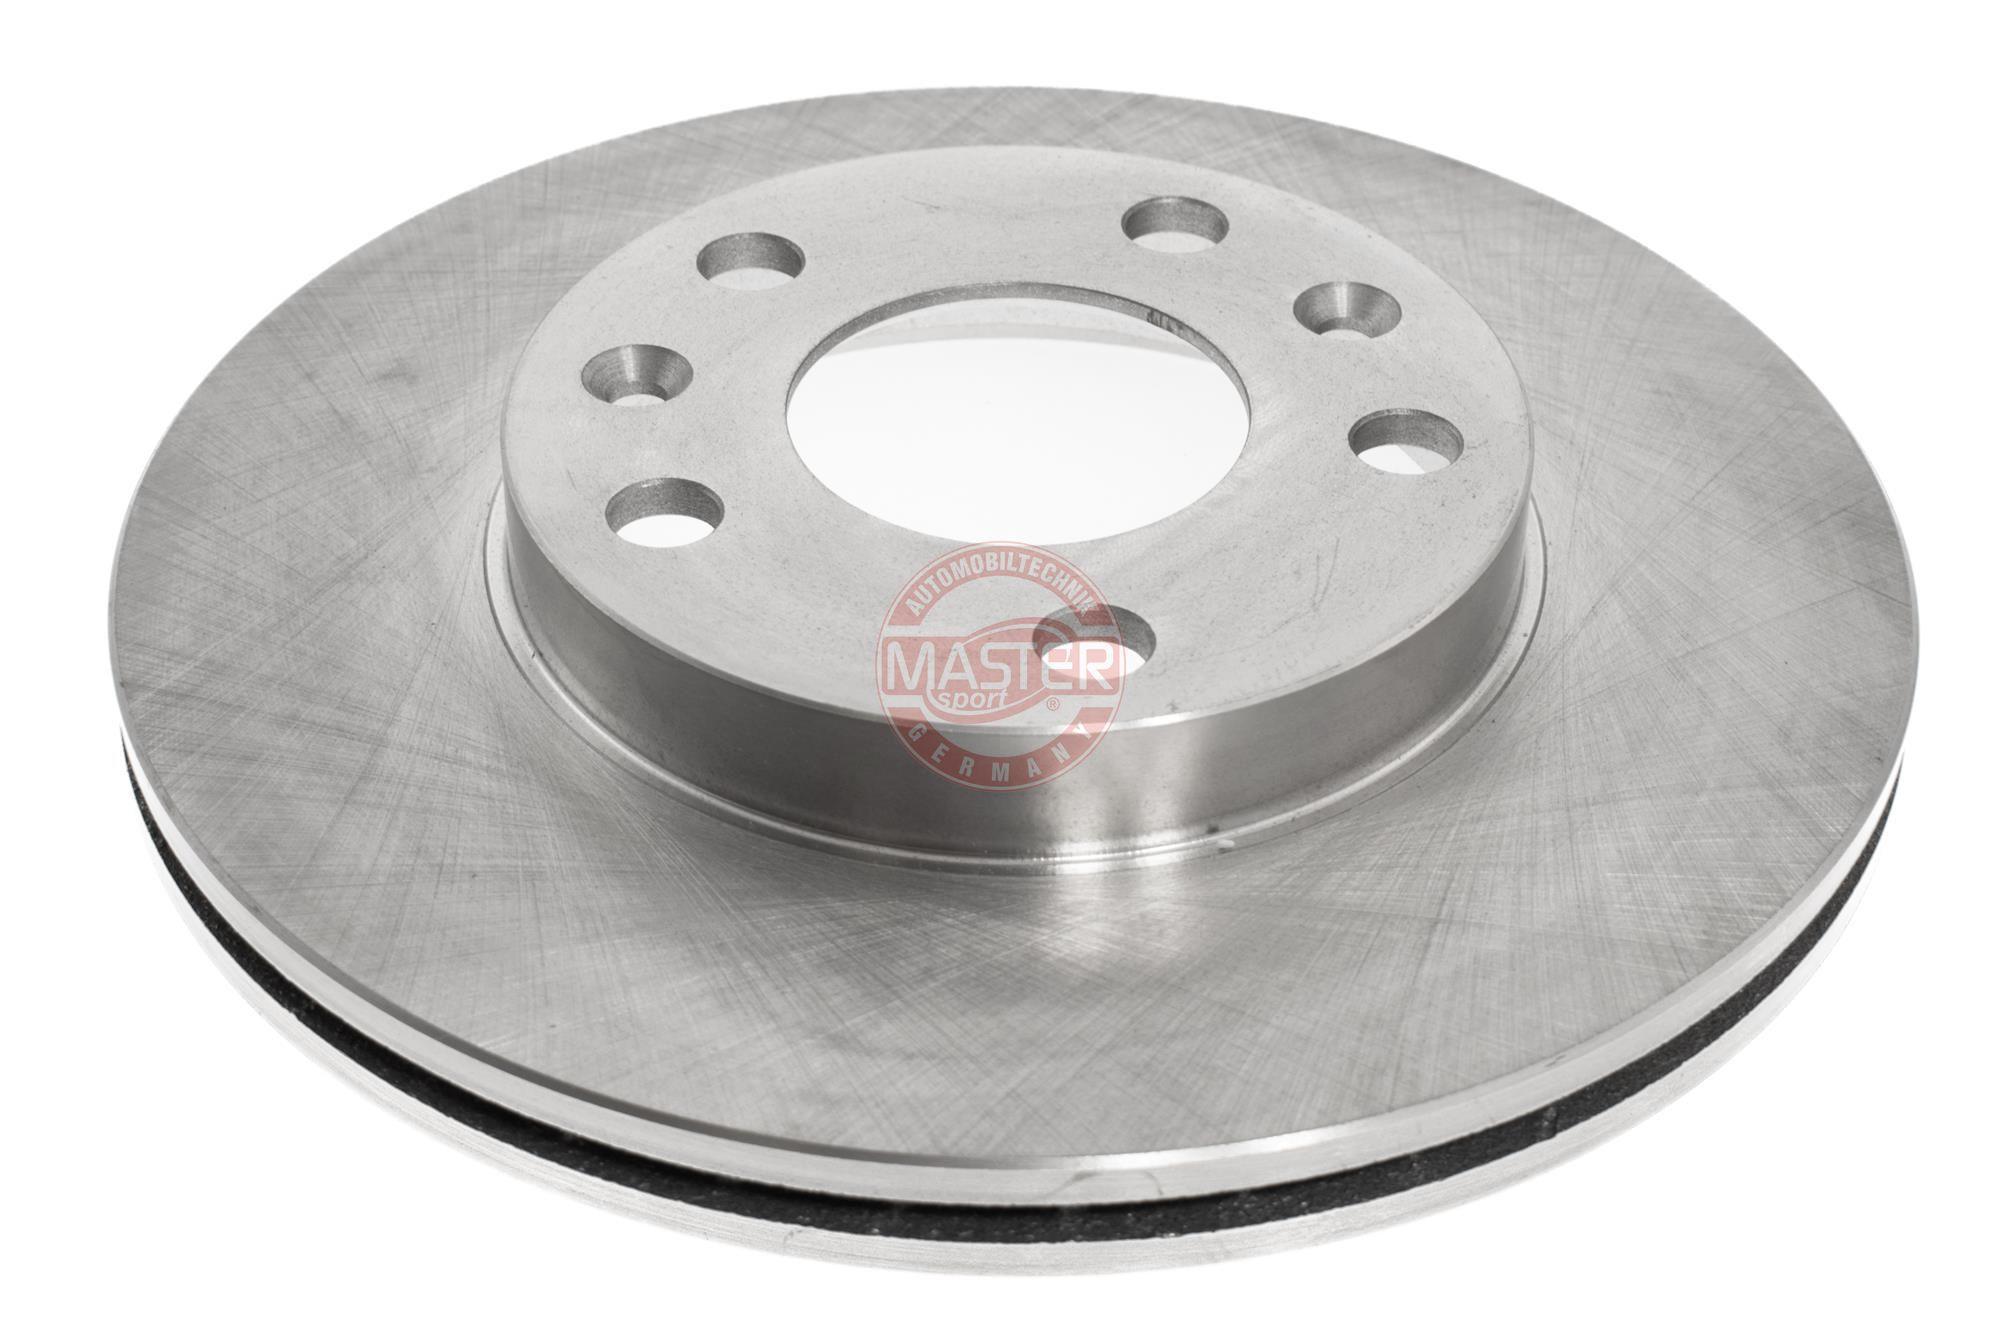 Bremsscheibe MASTER-SPORT 24012502211-PCS-MS Bewertungen